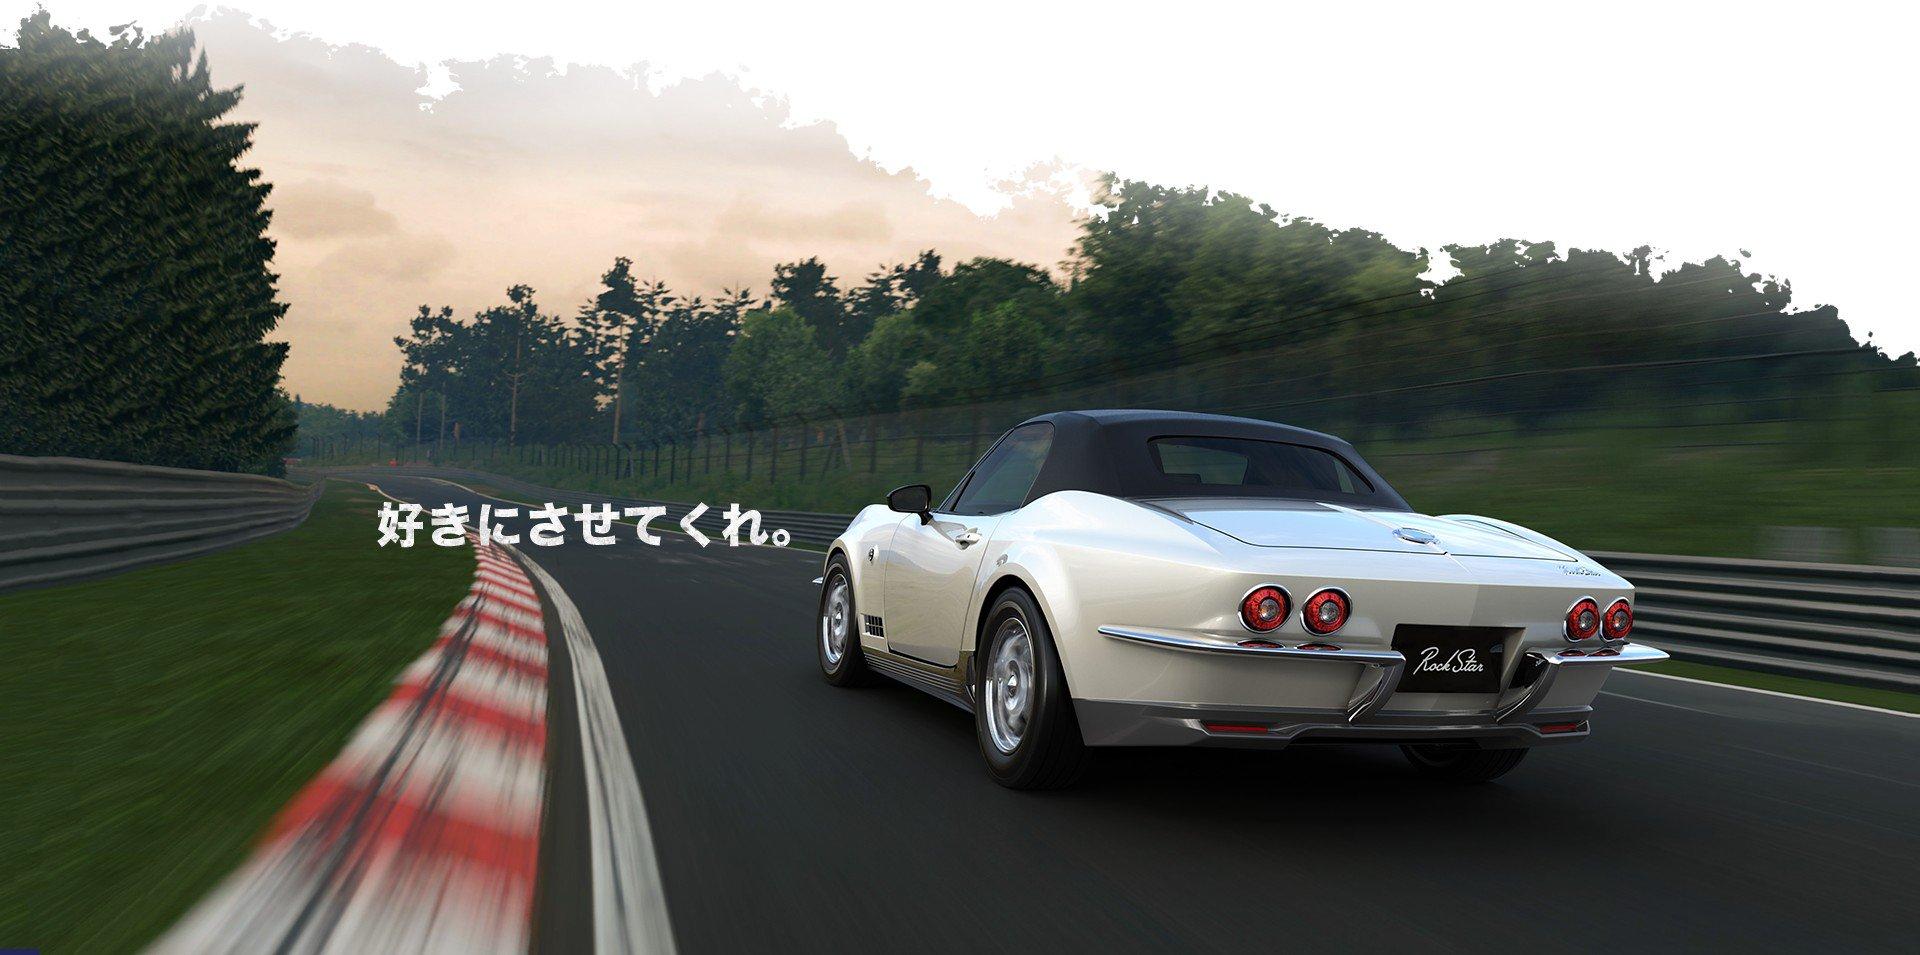 Mitsuoka Rock Star (5)